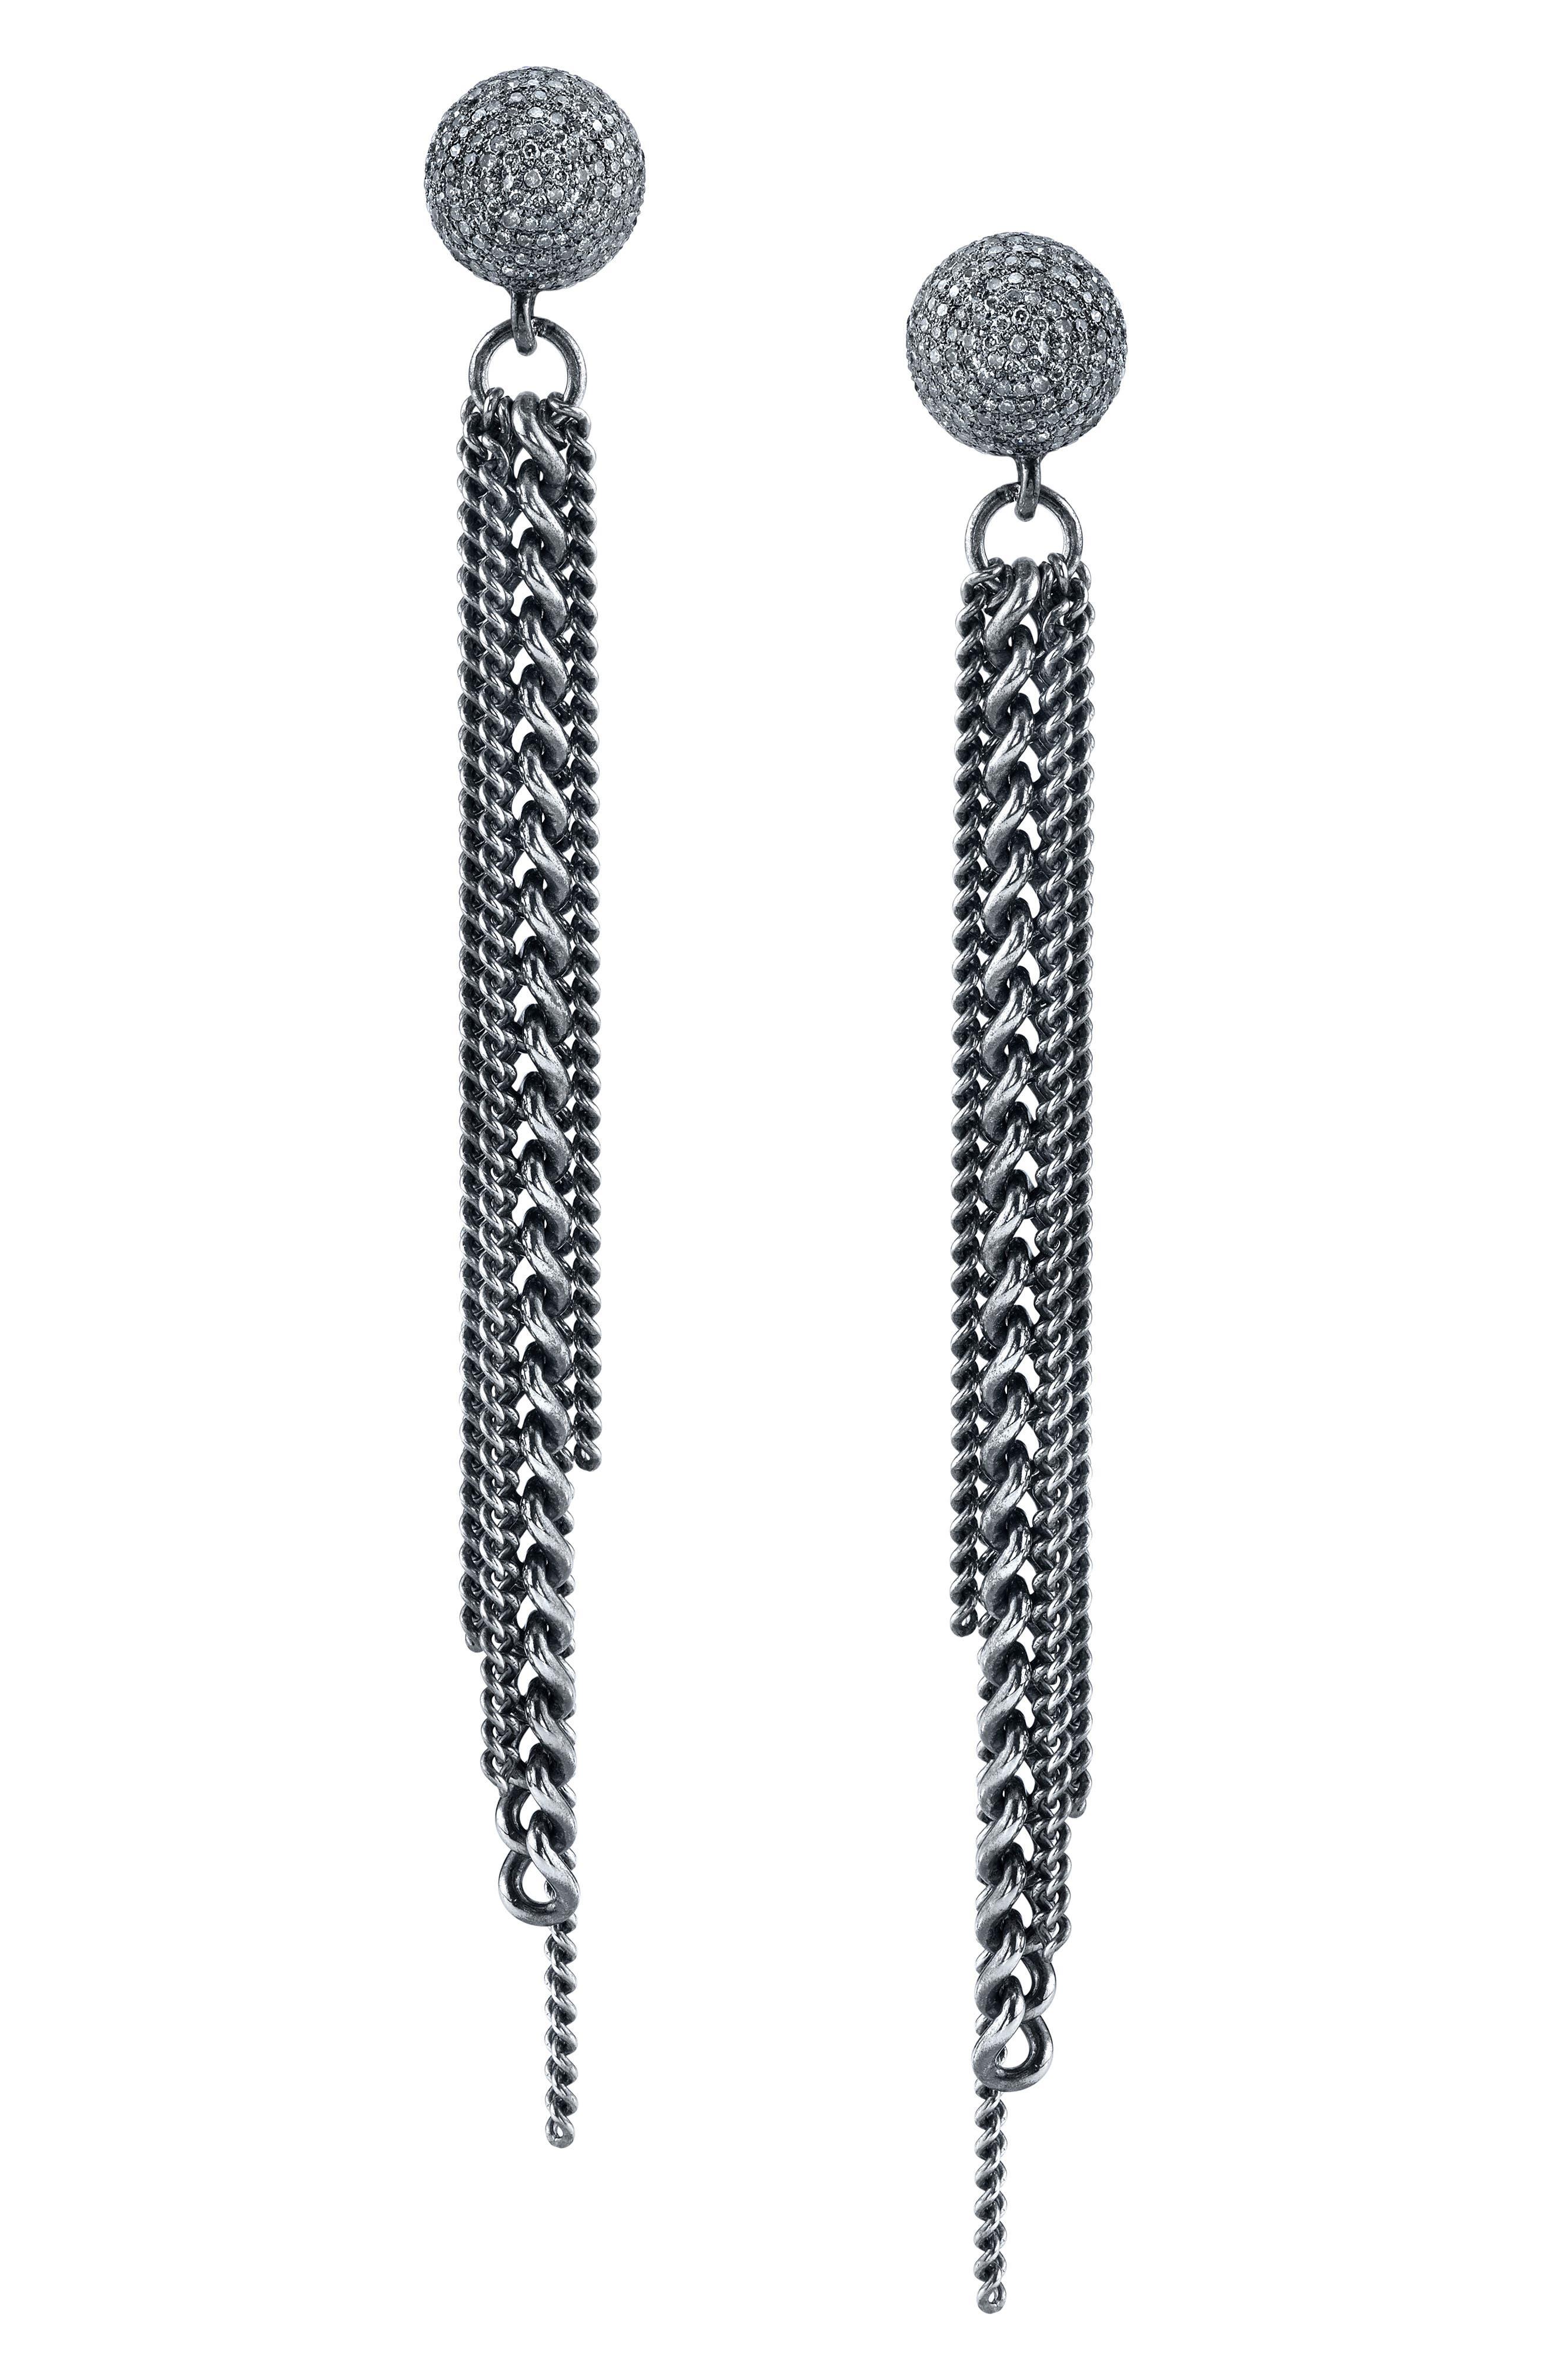 Fringe Earrings With Diamonds in Sterling Silver